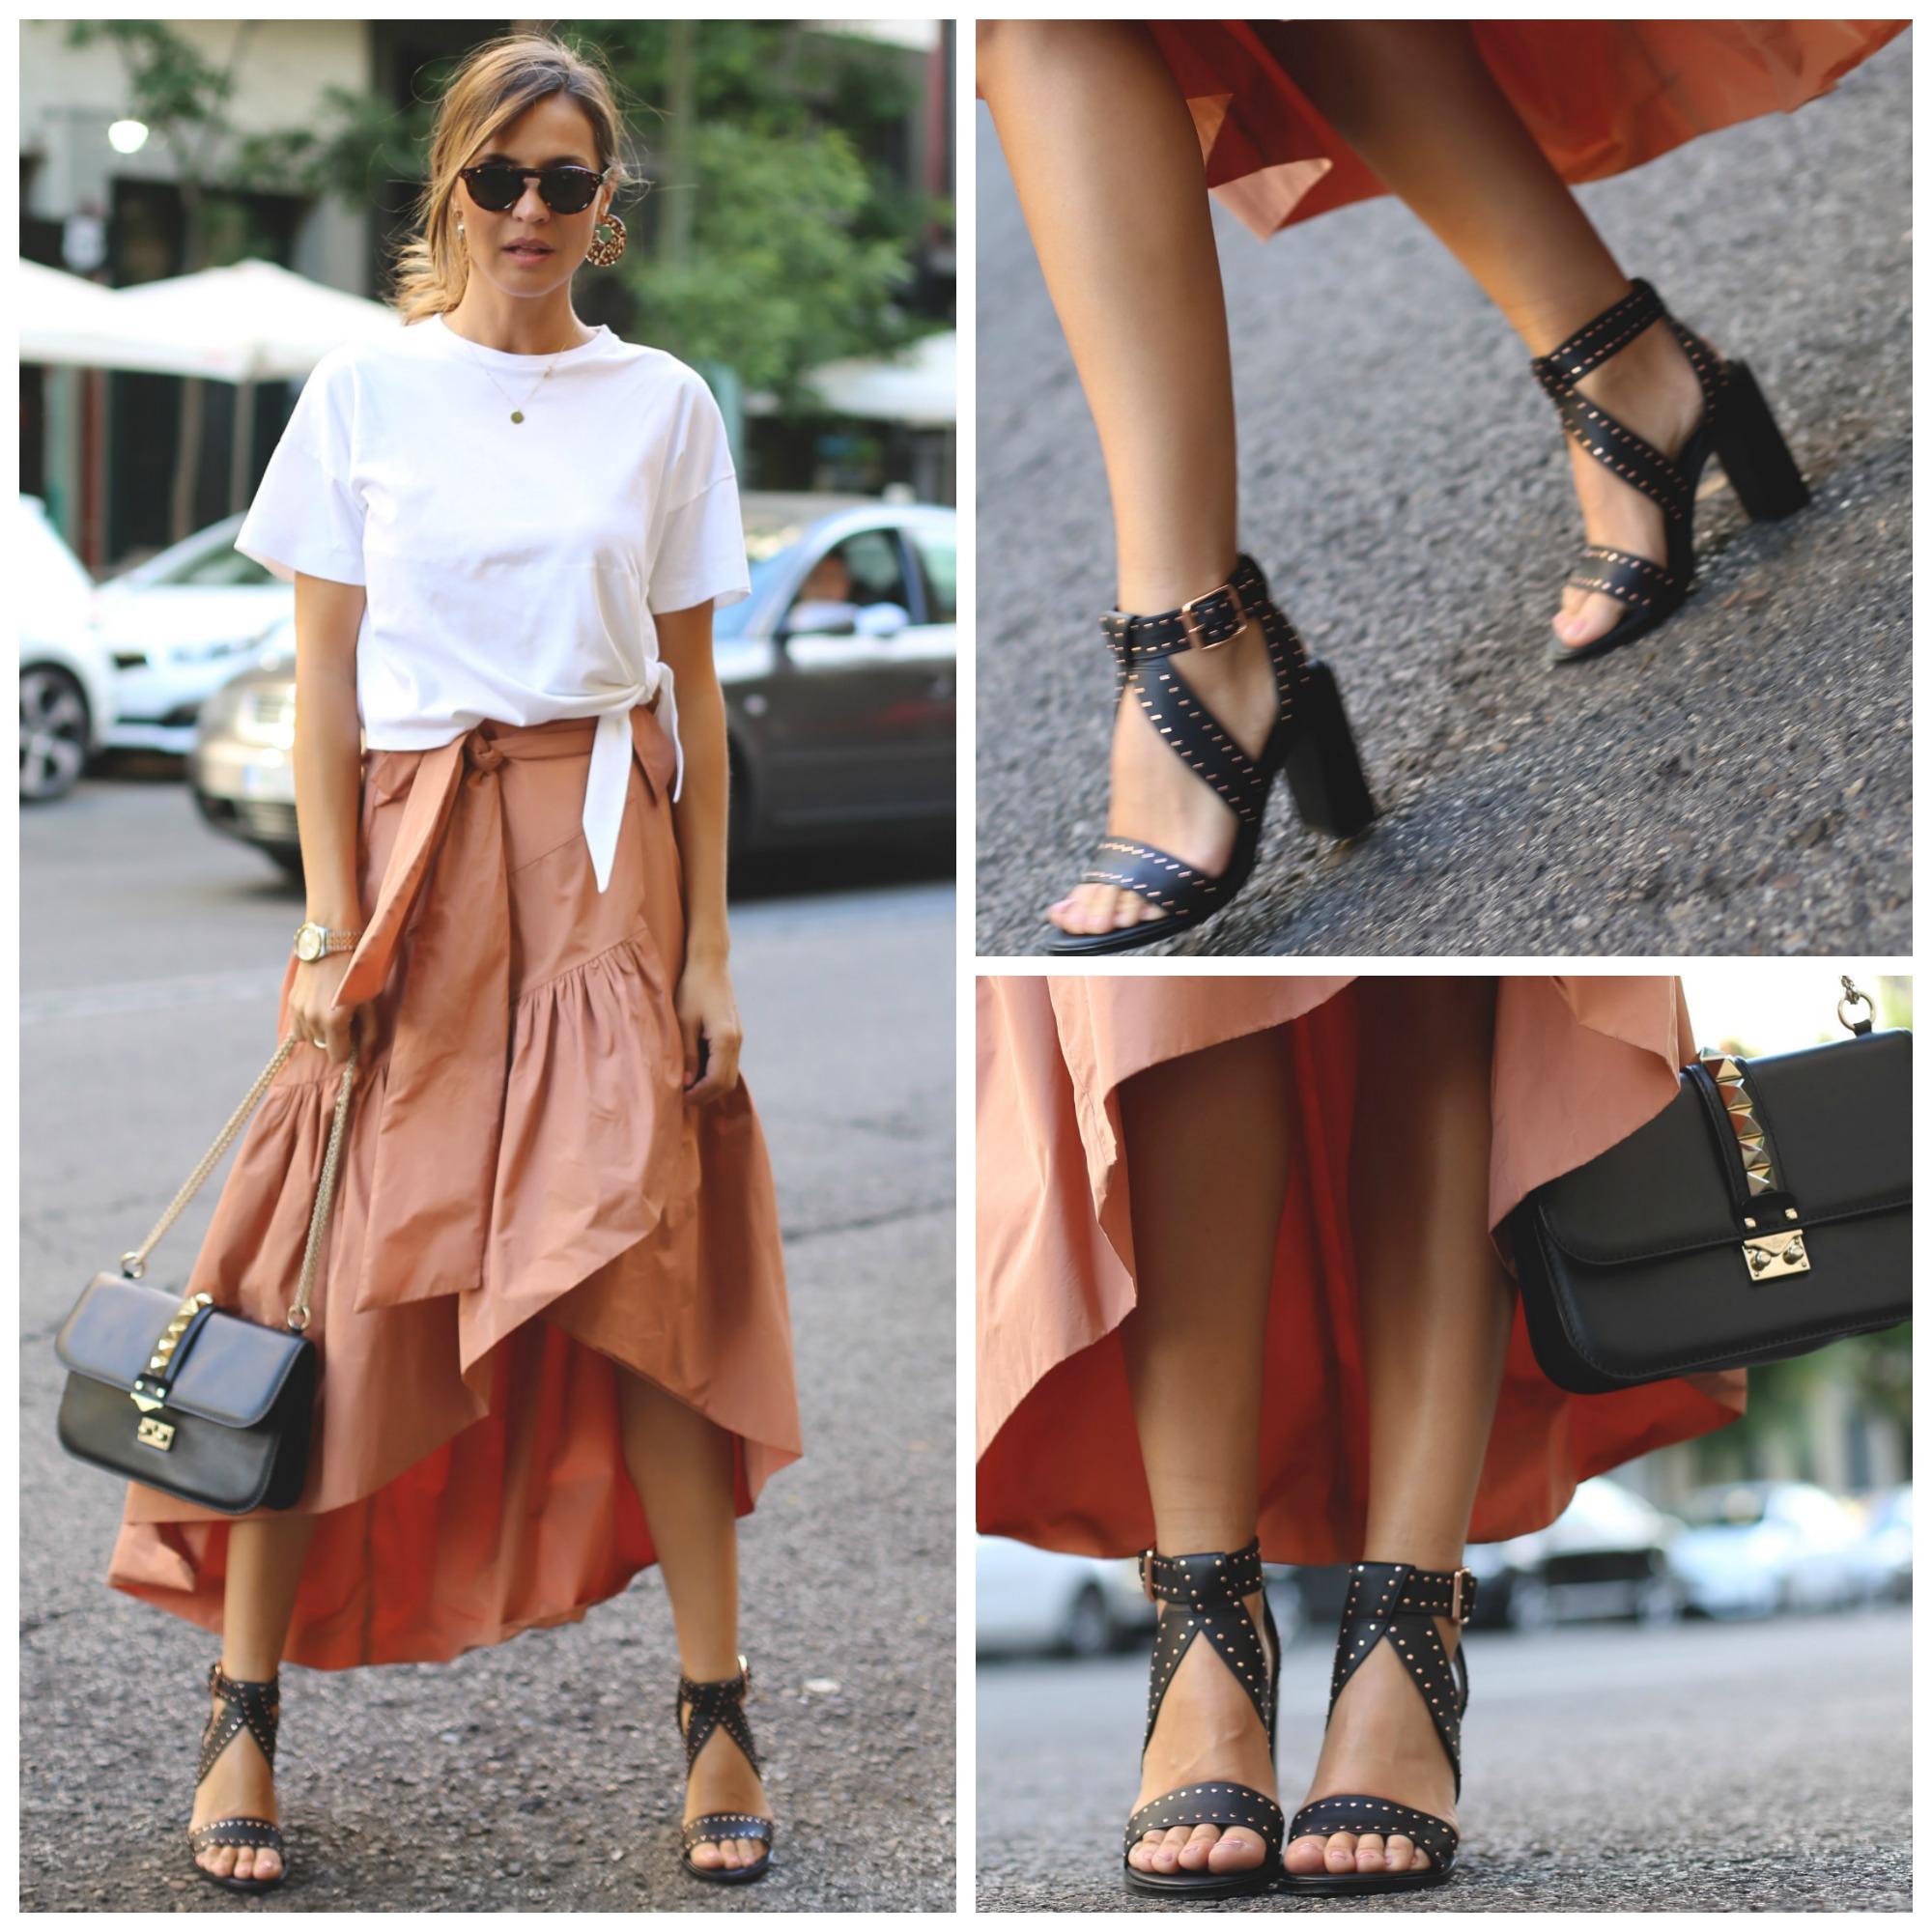 boho-skirt-and-heels